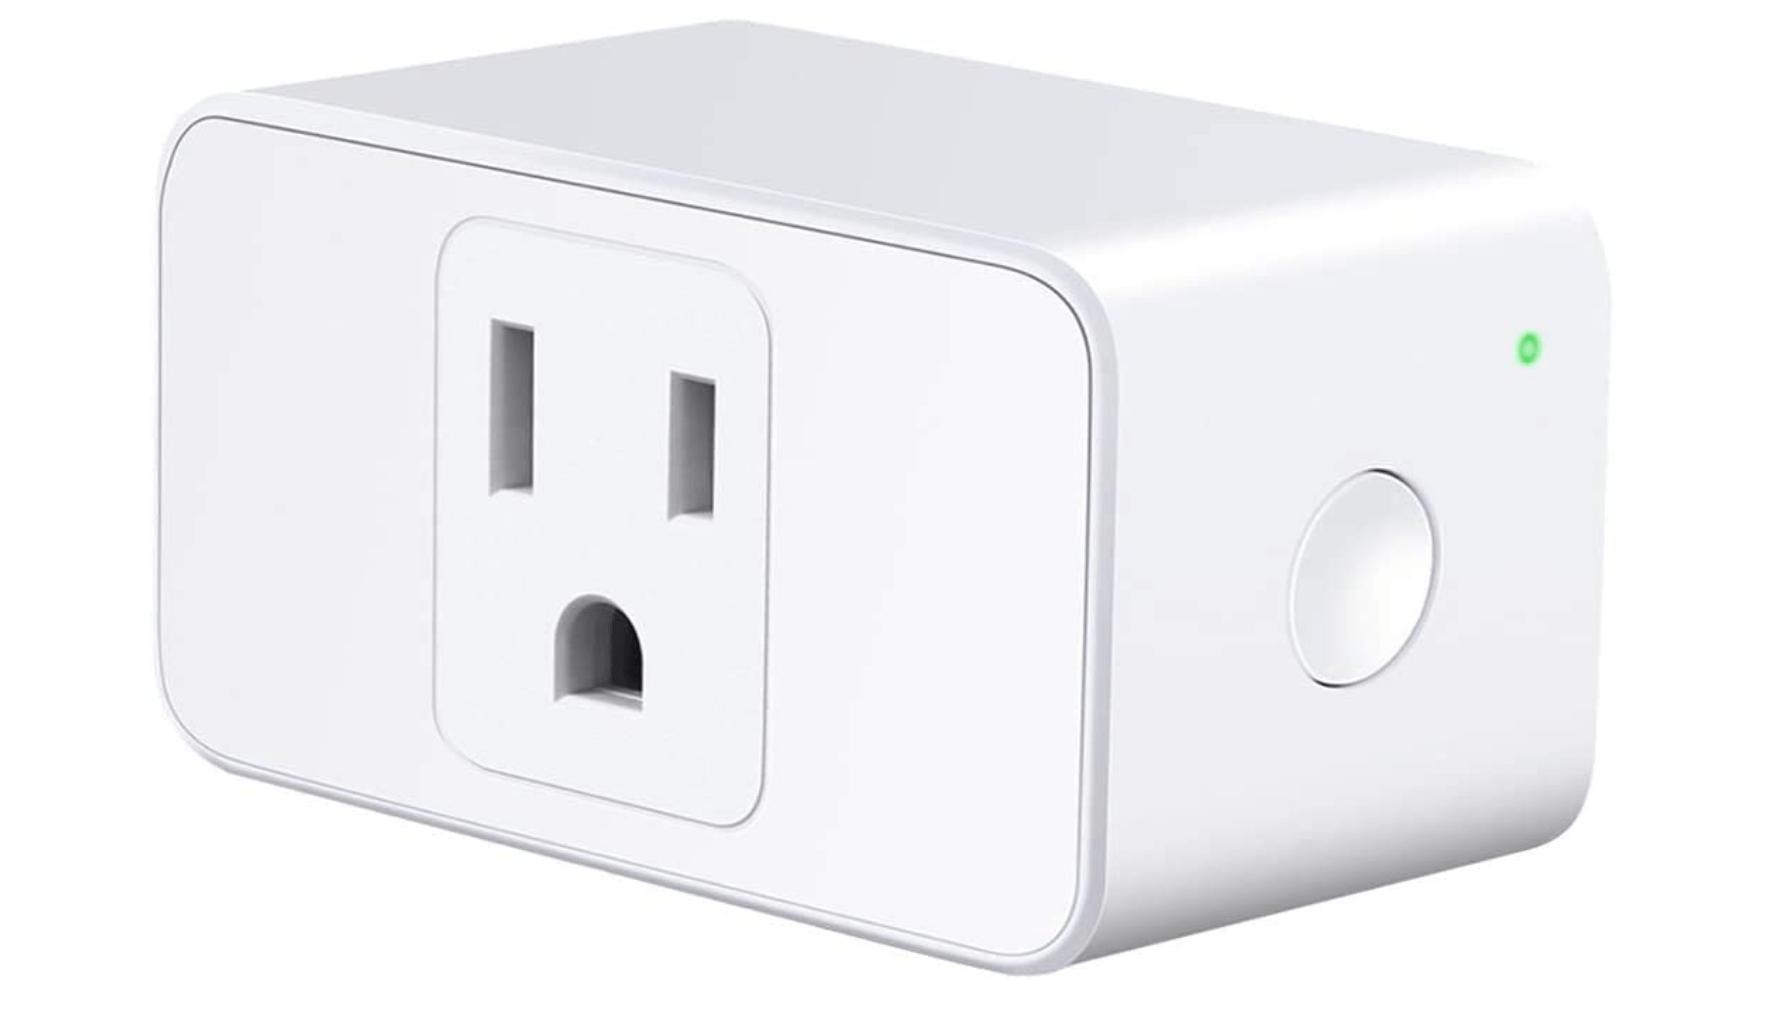 MeRoss Budget Smart Plug Mini